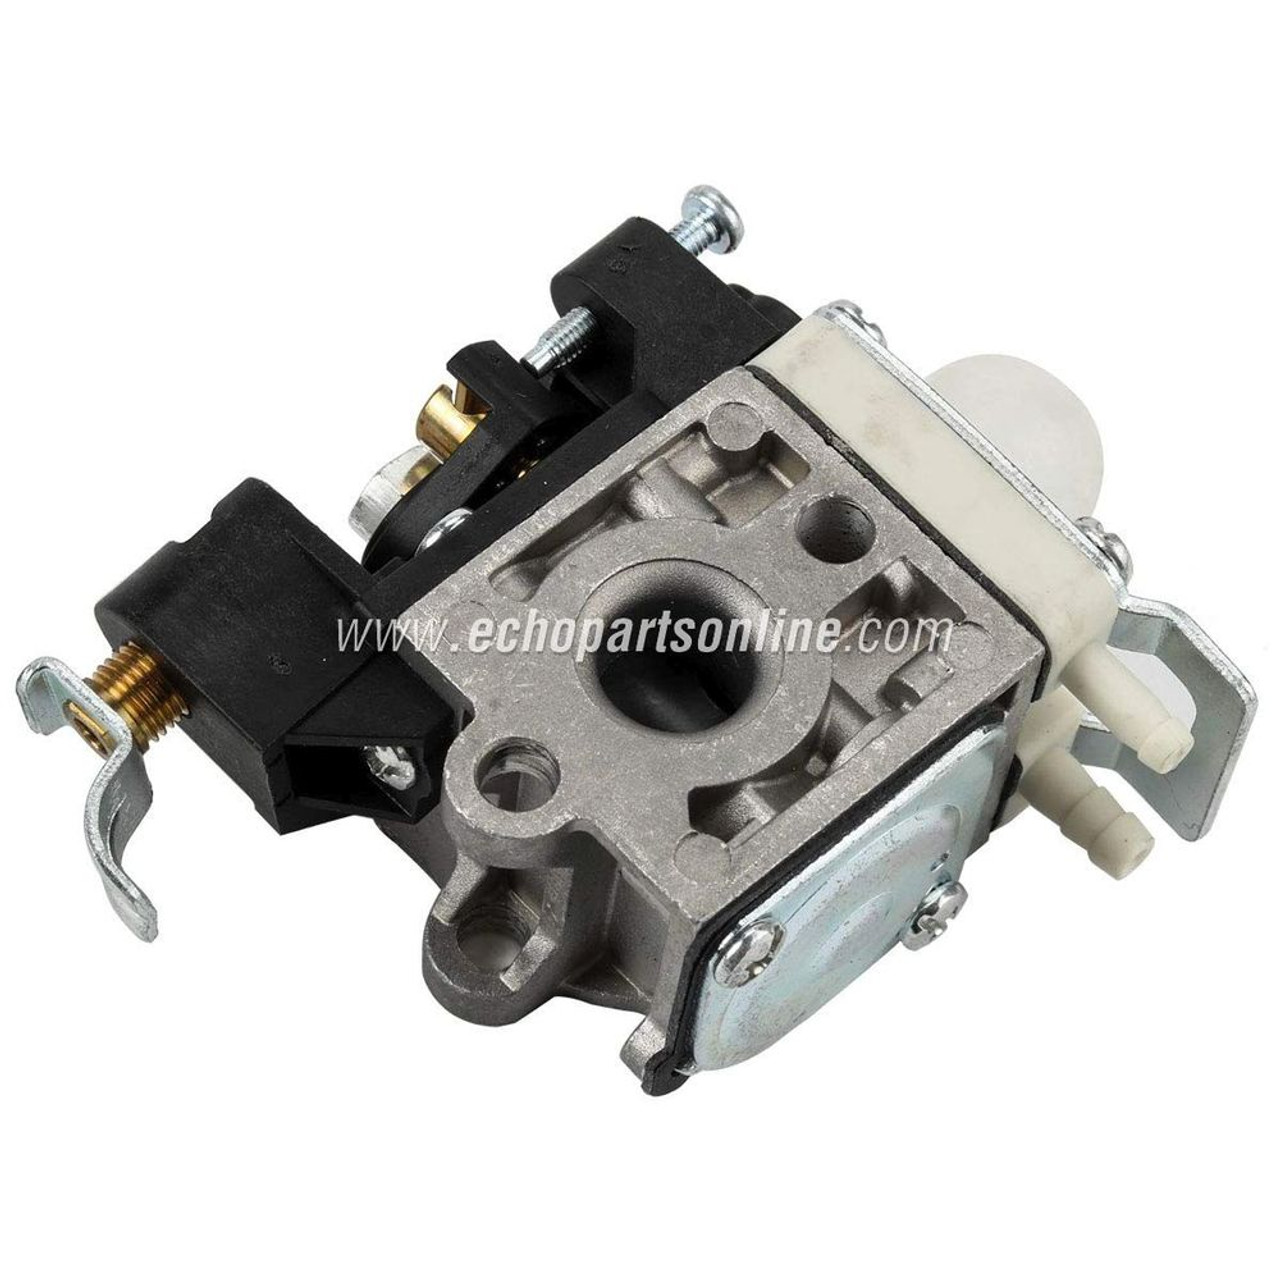 A021003661 Genuine ECHO Carburetor RB-K106 for PB-250 ES-250 PB-250LN A021003660